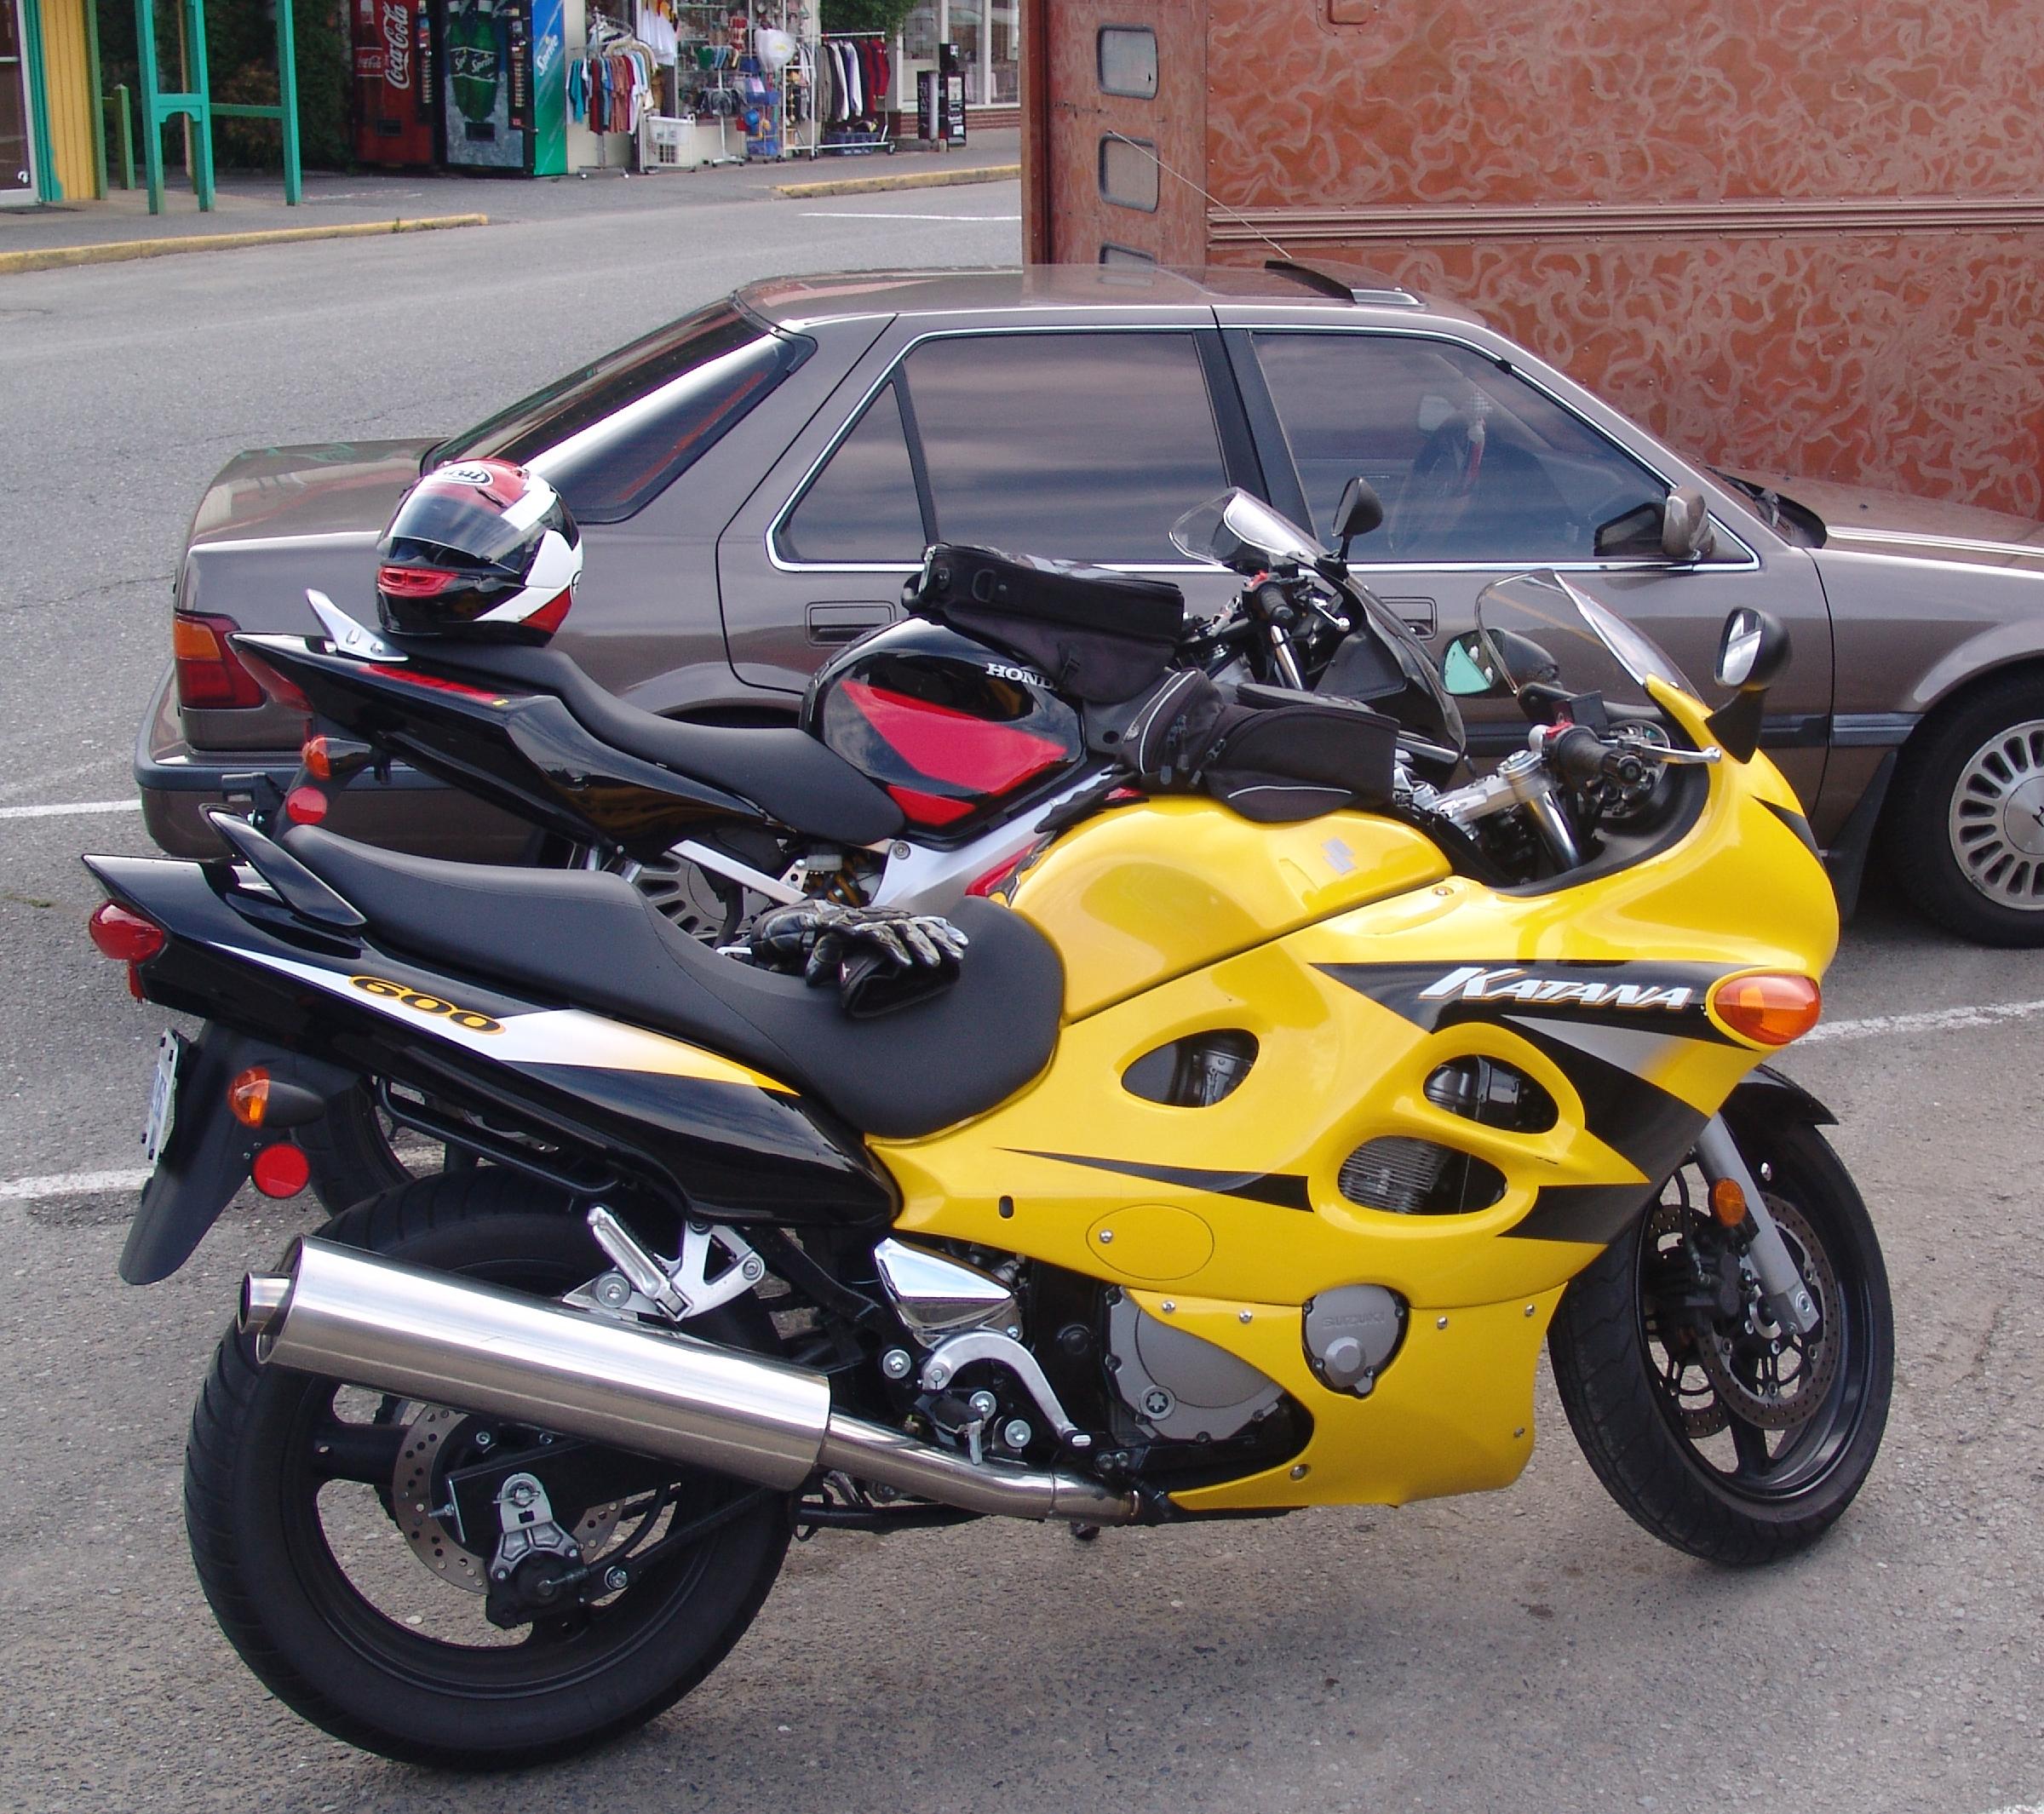 Suzuki Katana Body For Sale Unpainted